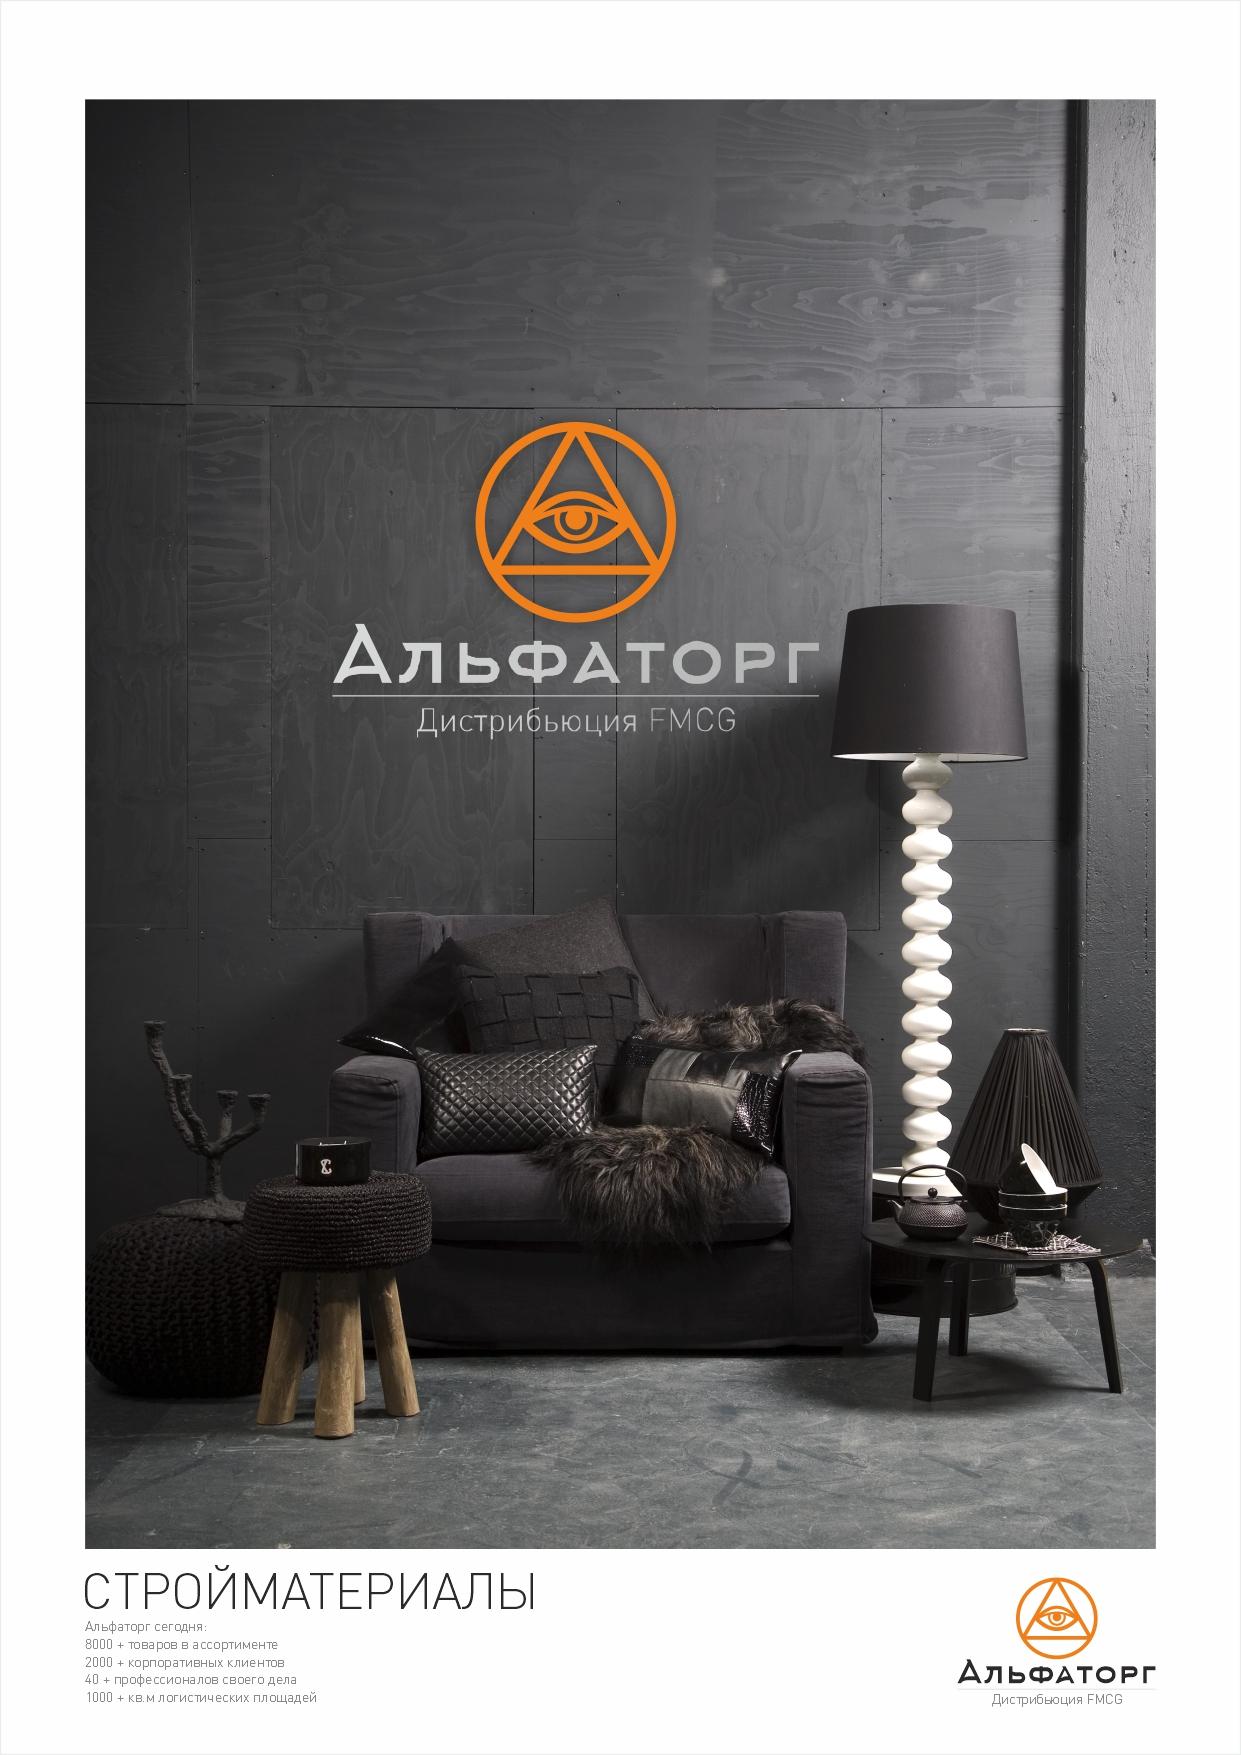 Логотип и фирменный стиль фото f_0495ef96ca9184ca.jpg